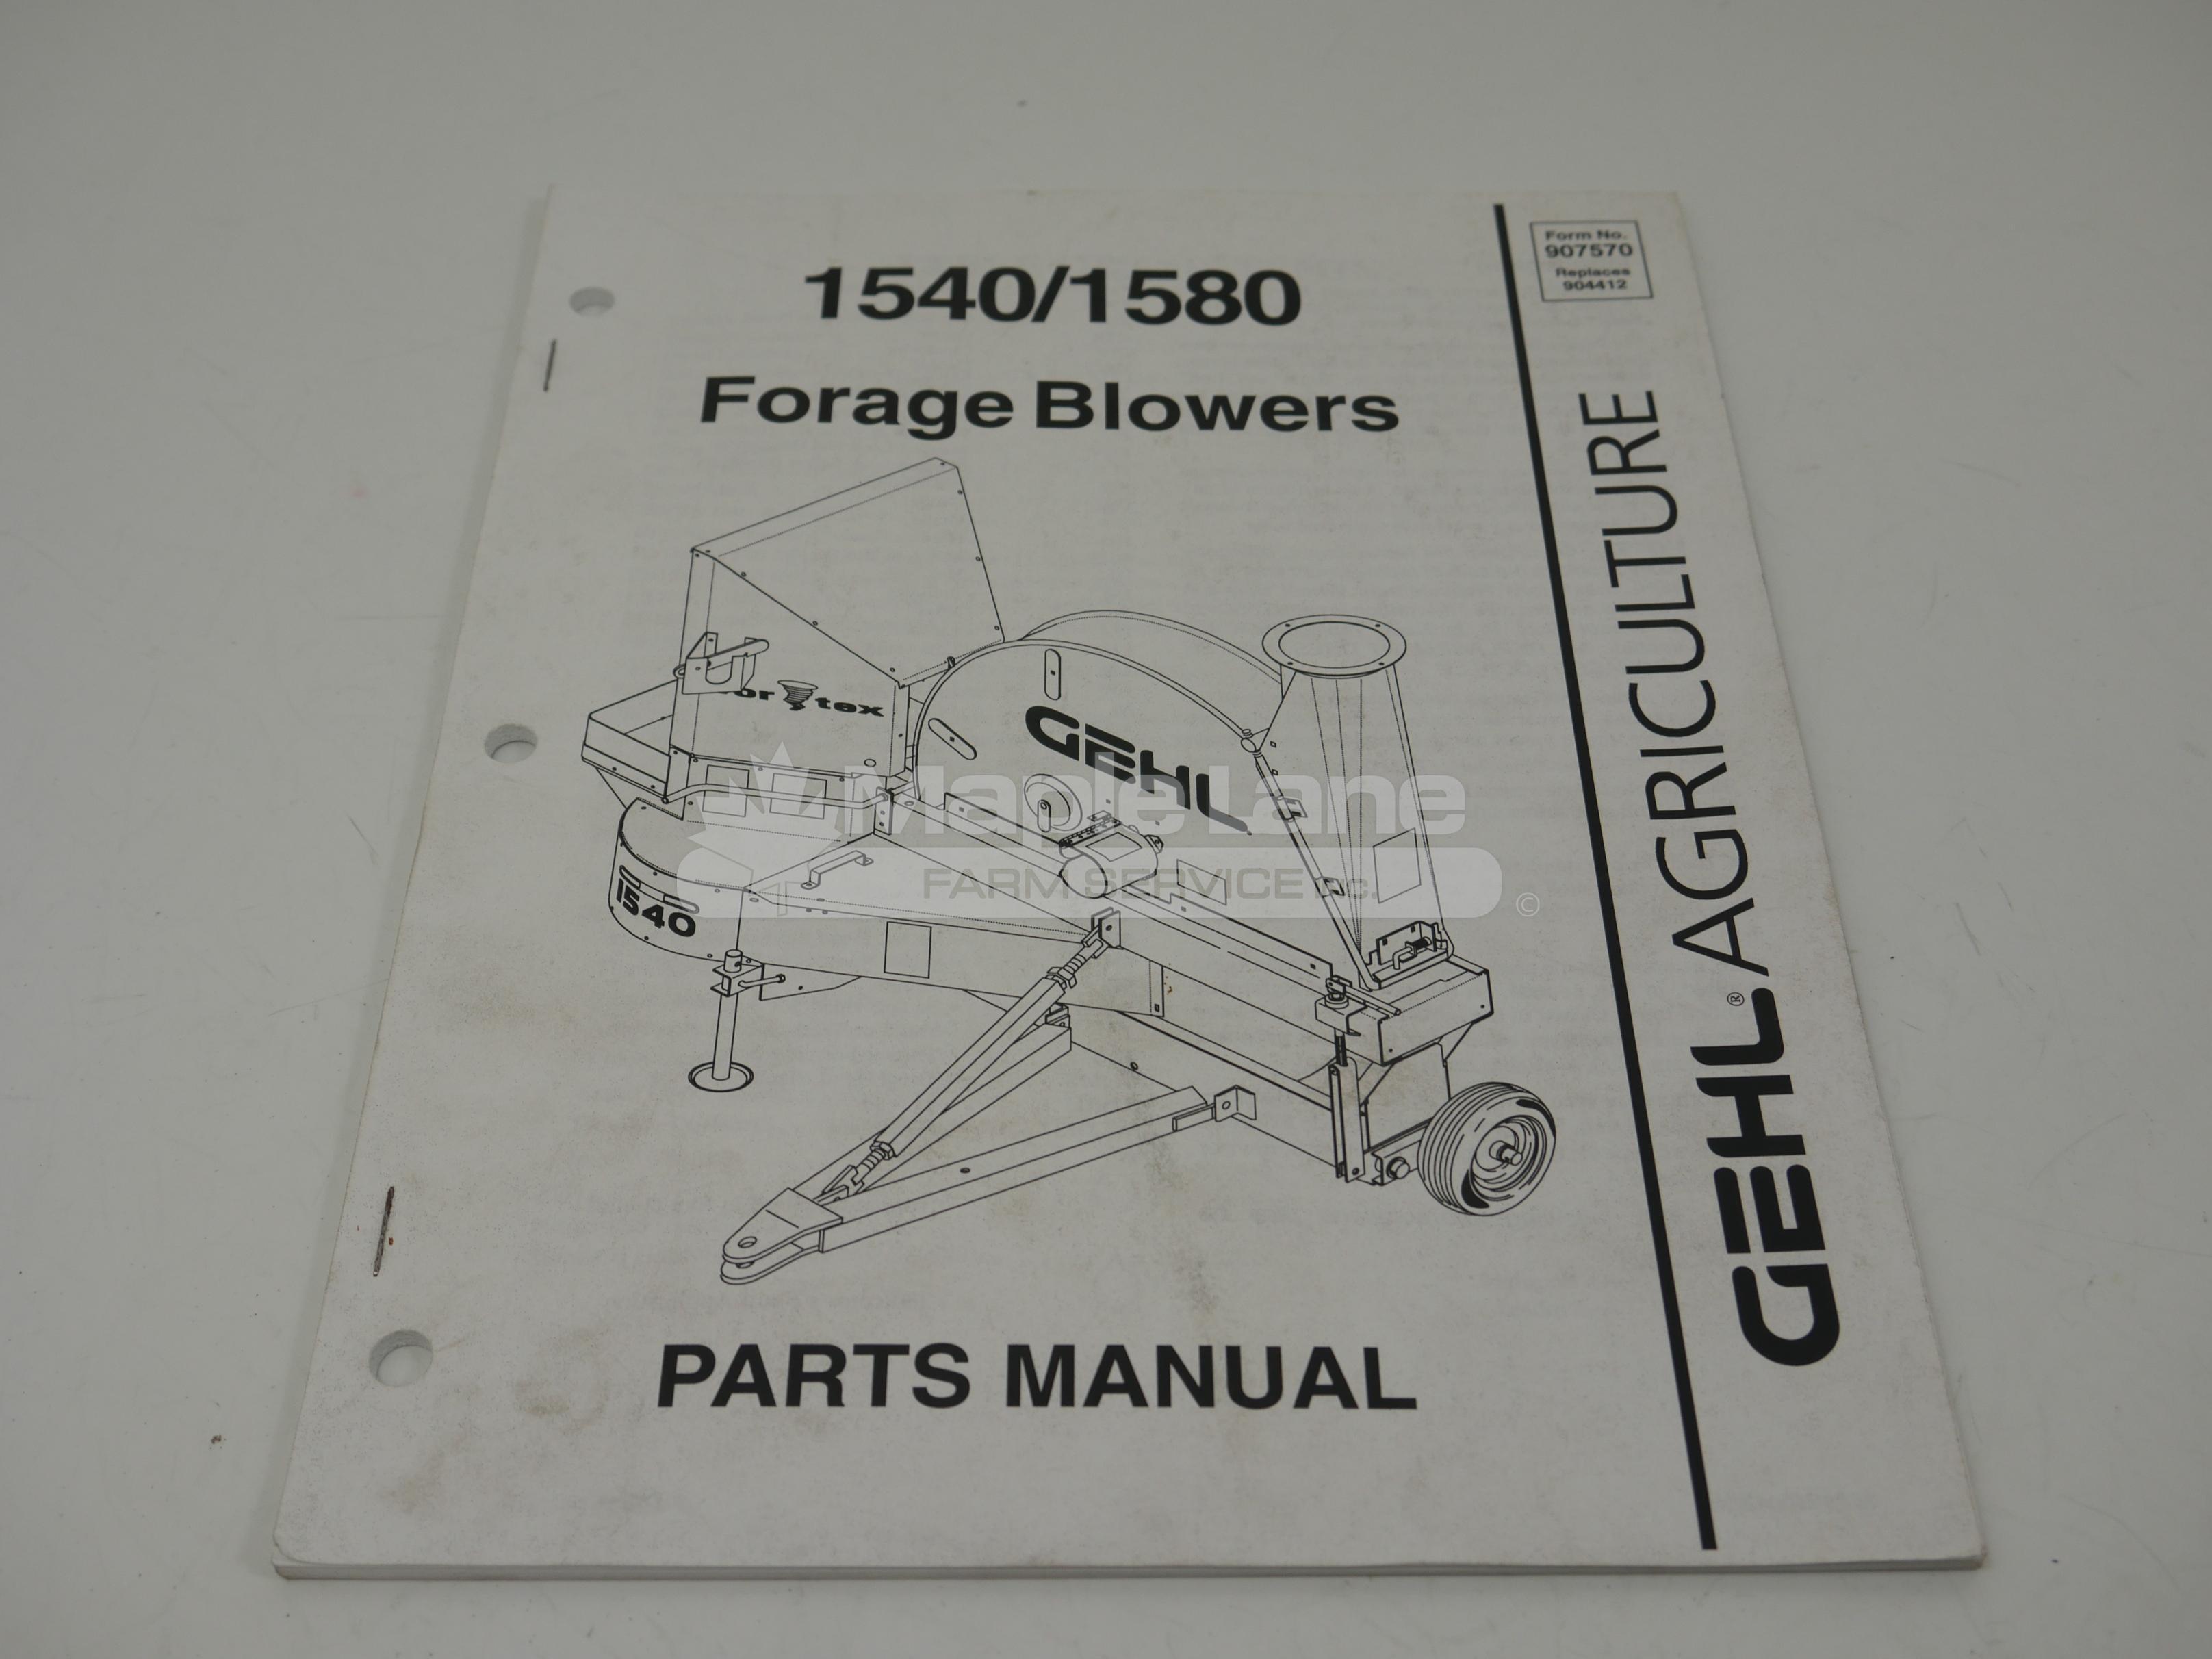 907570 Parts Manual